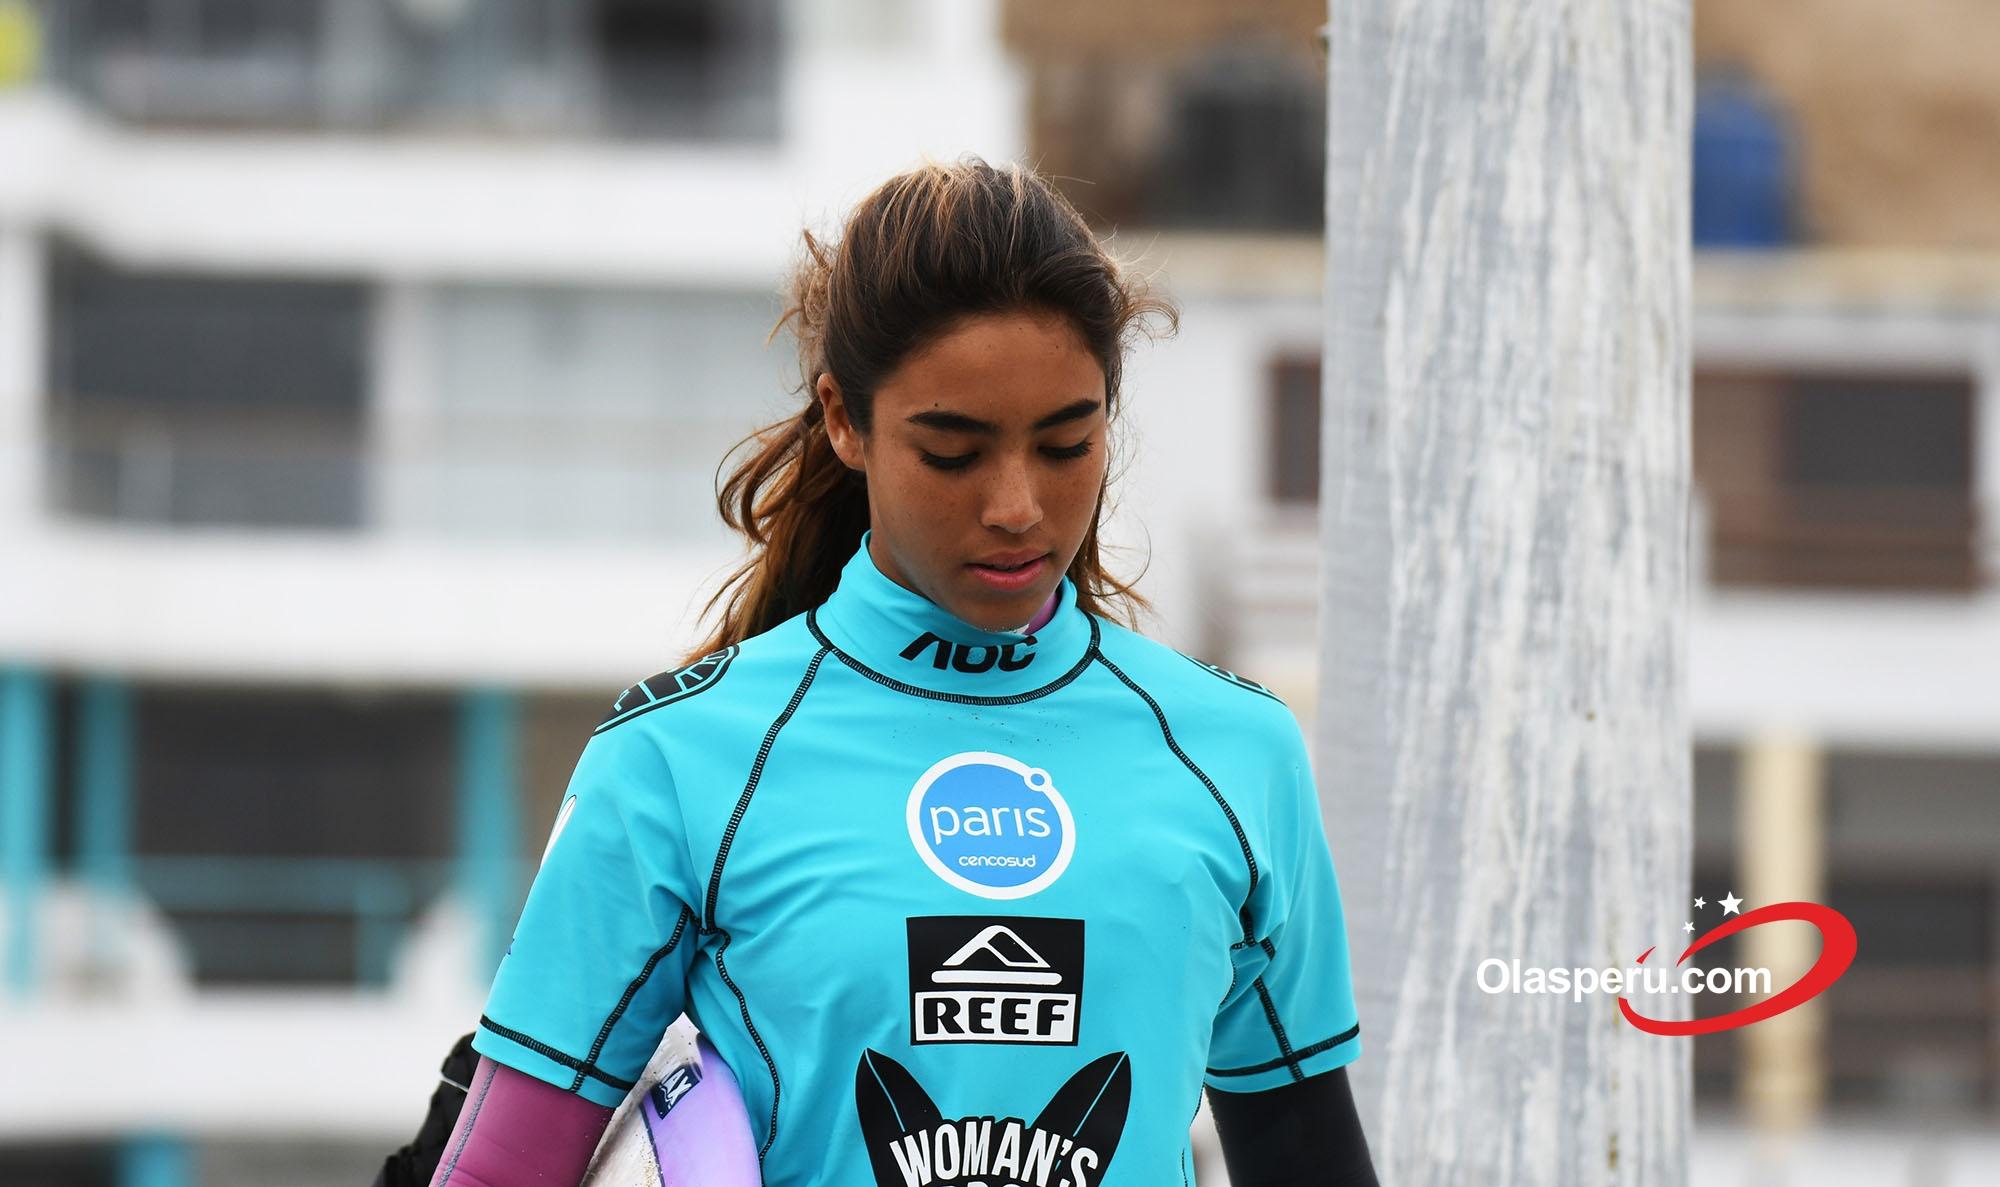 París Reef Women's Pro 2017 - DÍA 2